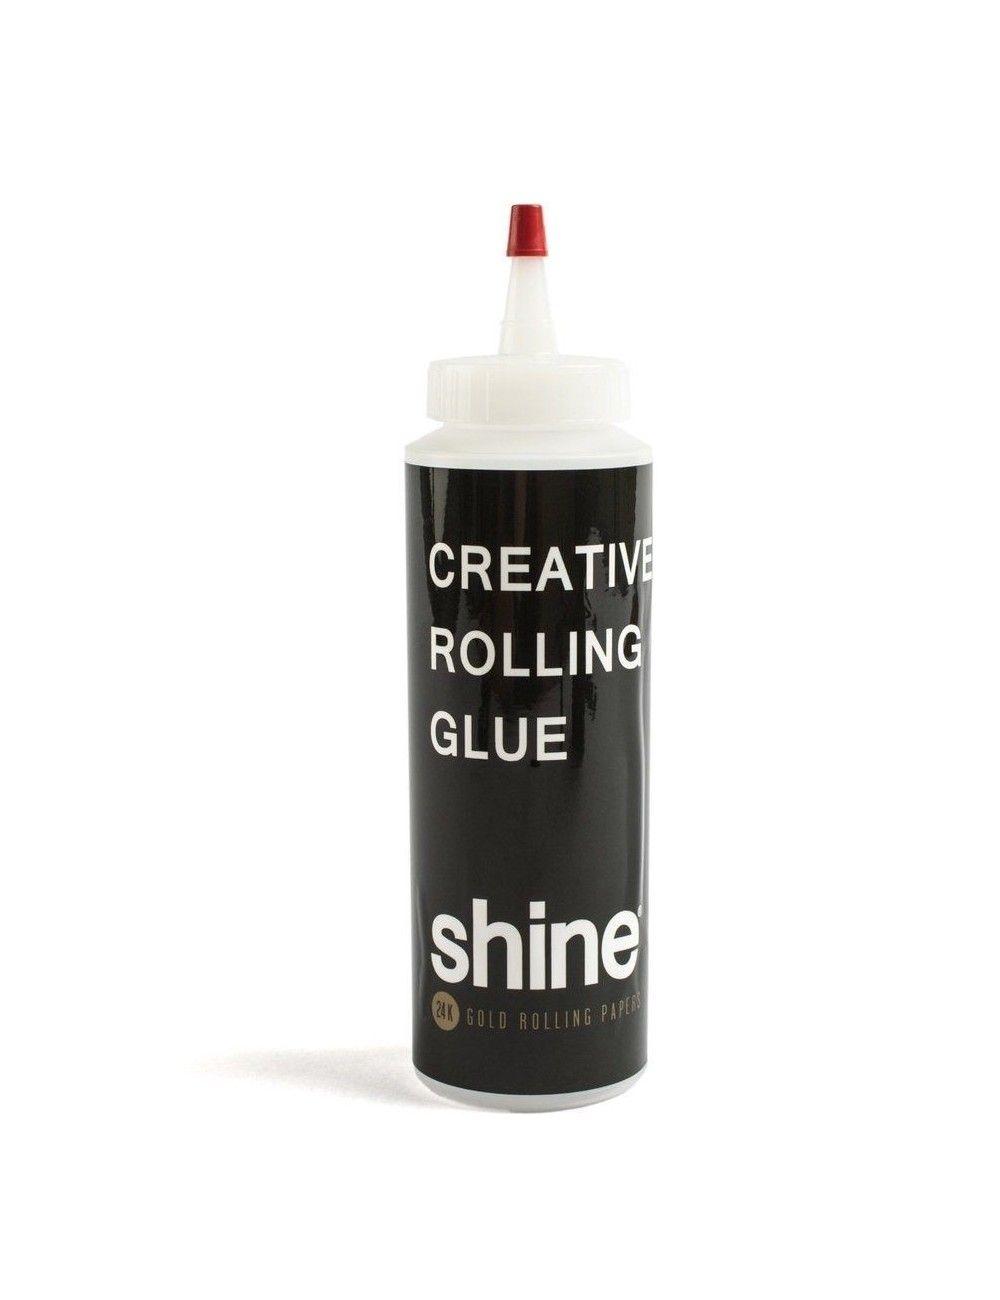 Shine Creative Rolling Glue